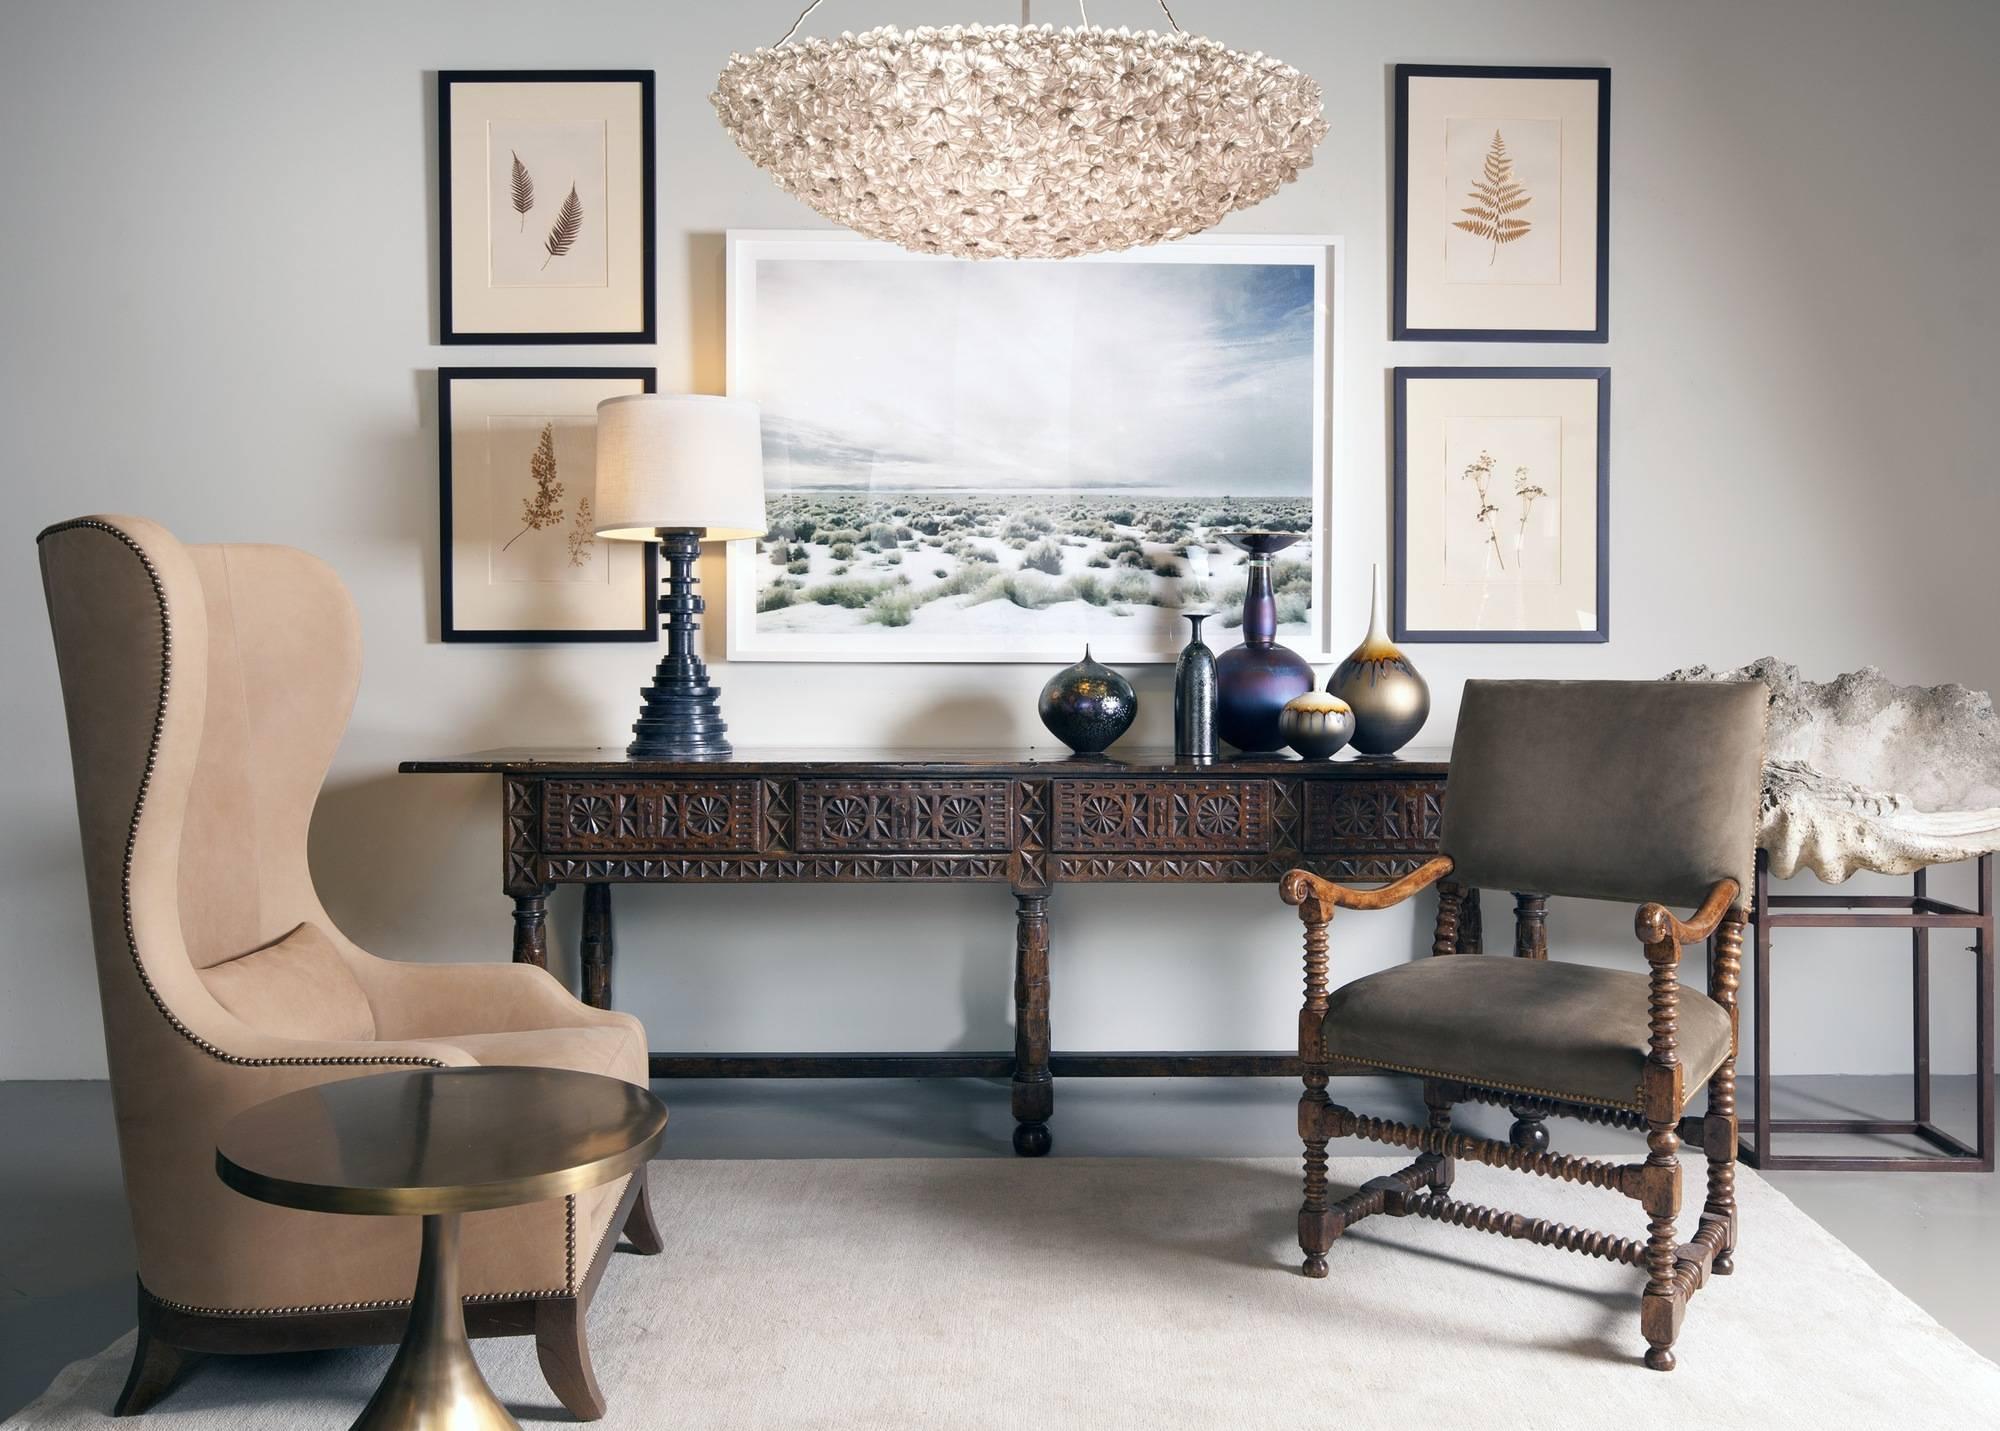 Wonderful 10 Interior Design Tips Everyone Should Know